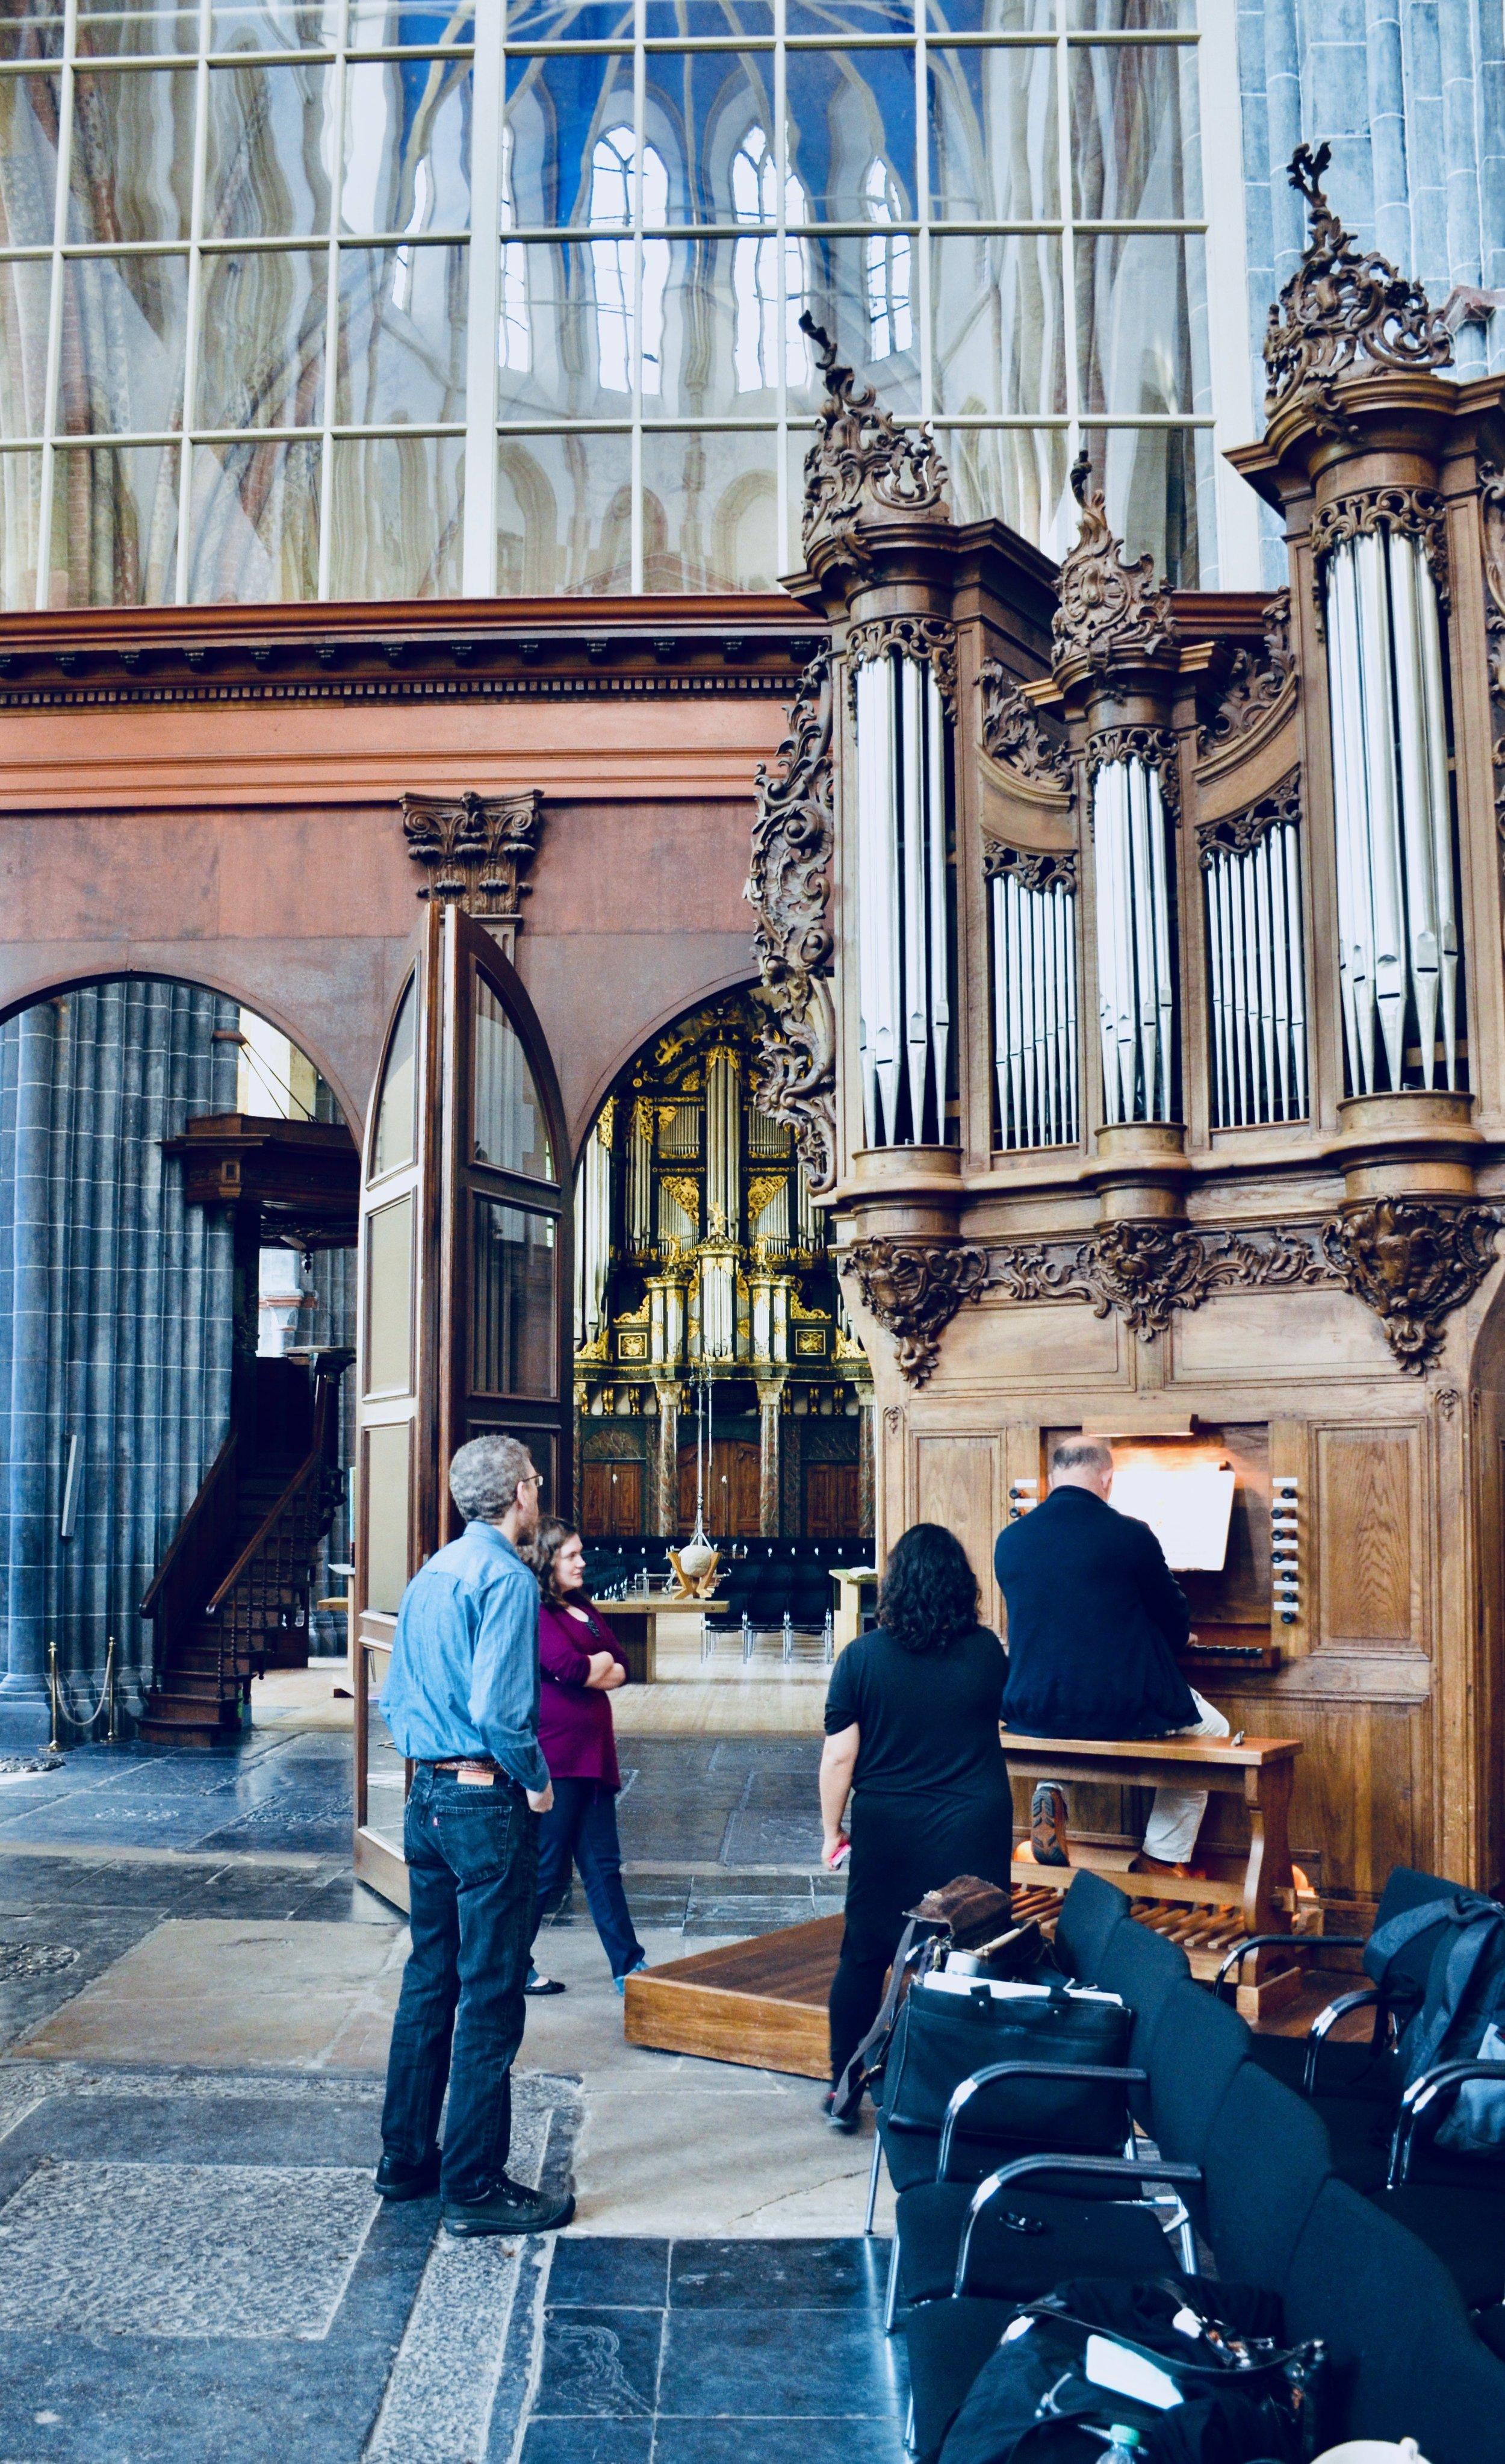 Erwin Wiersinga demonstrates the 1742 Le Picard organ in Martinikerk, Groningen. Boston Organ Studio.